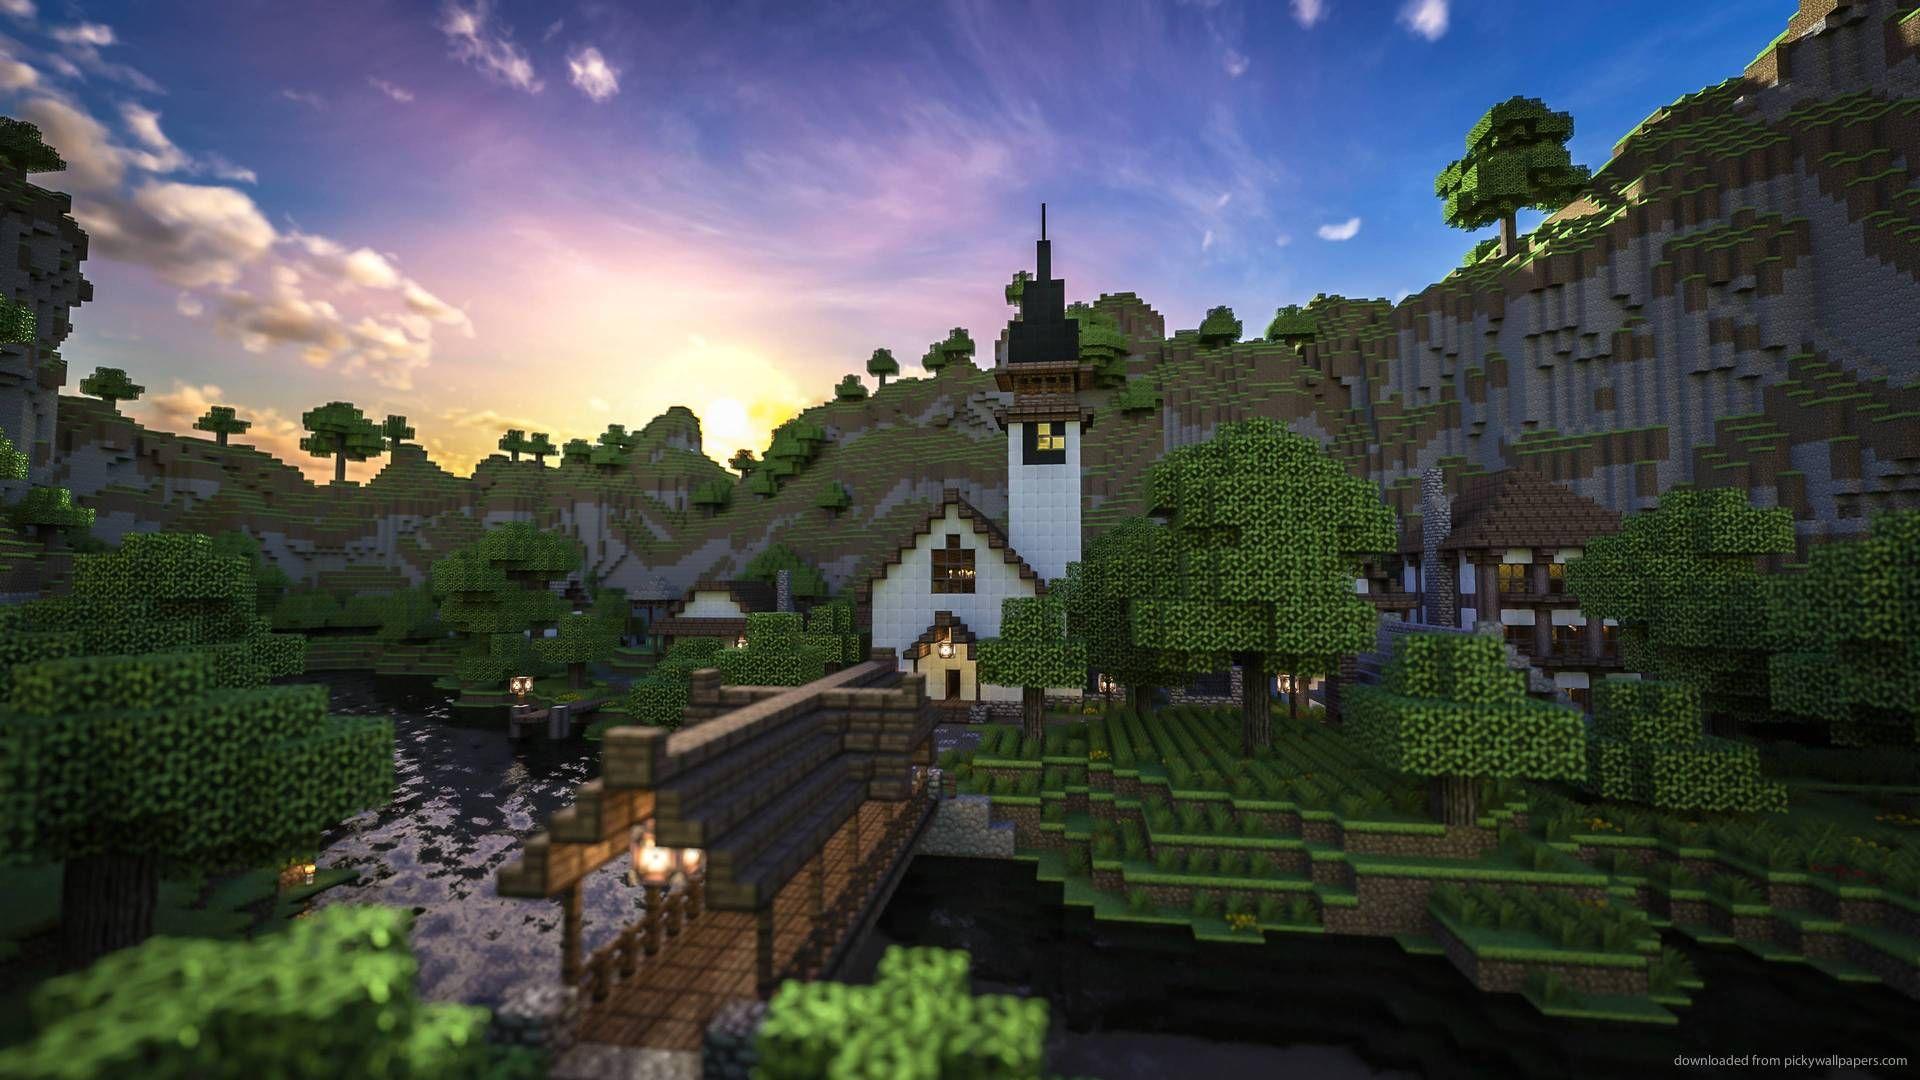 x Minecraft Backgrounds Album on Imgur